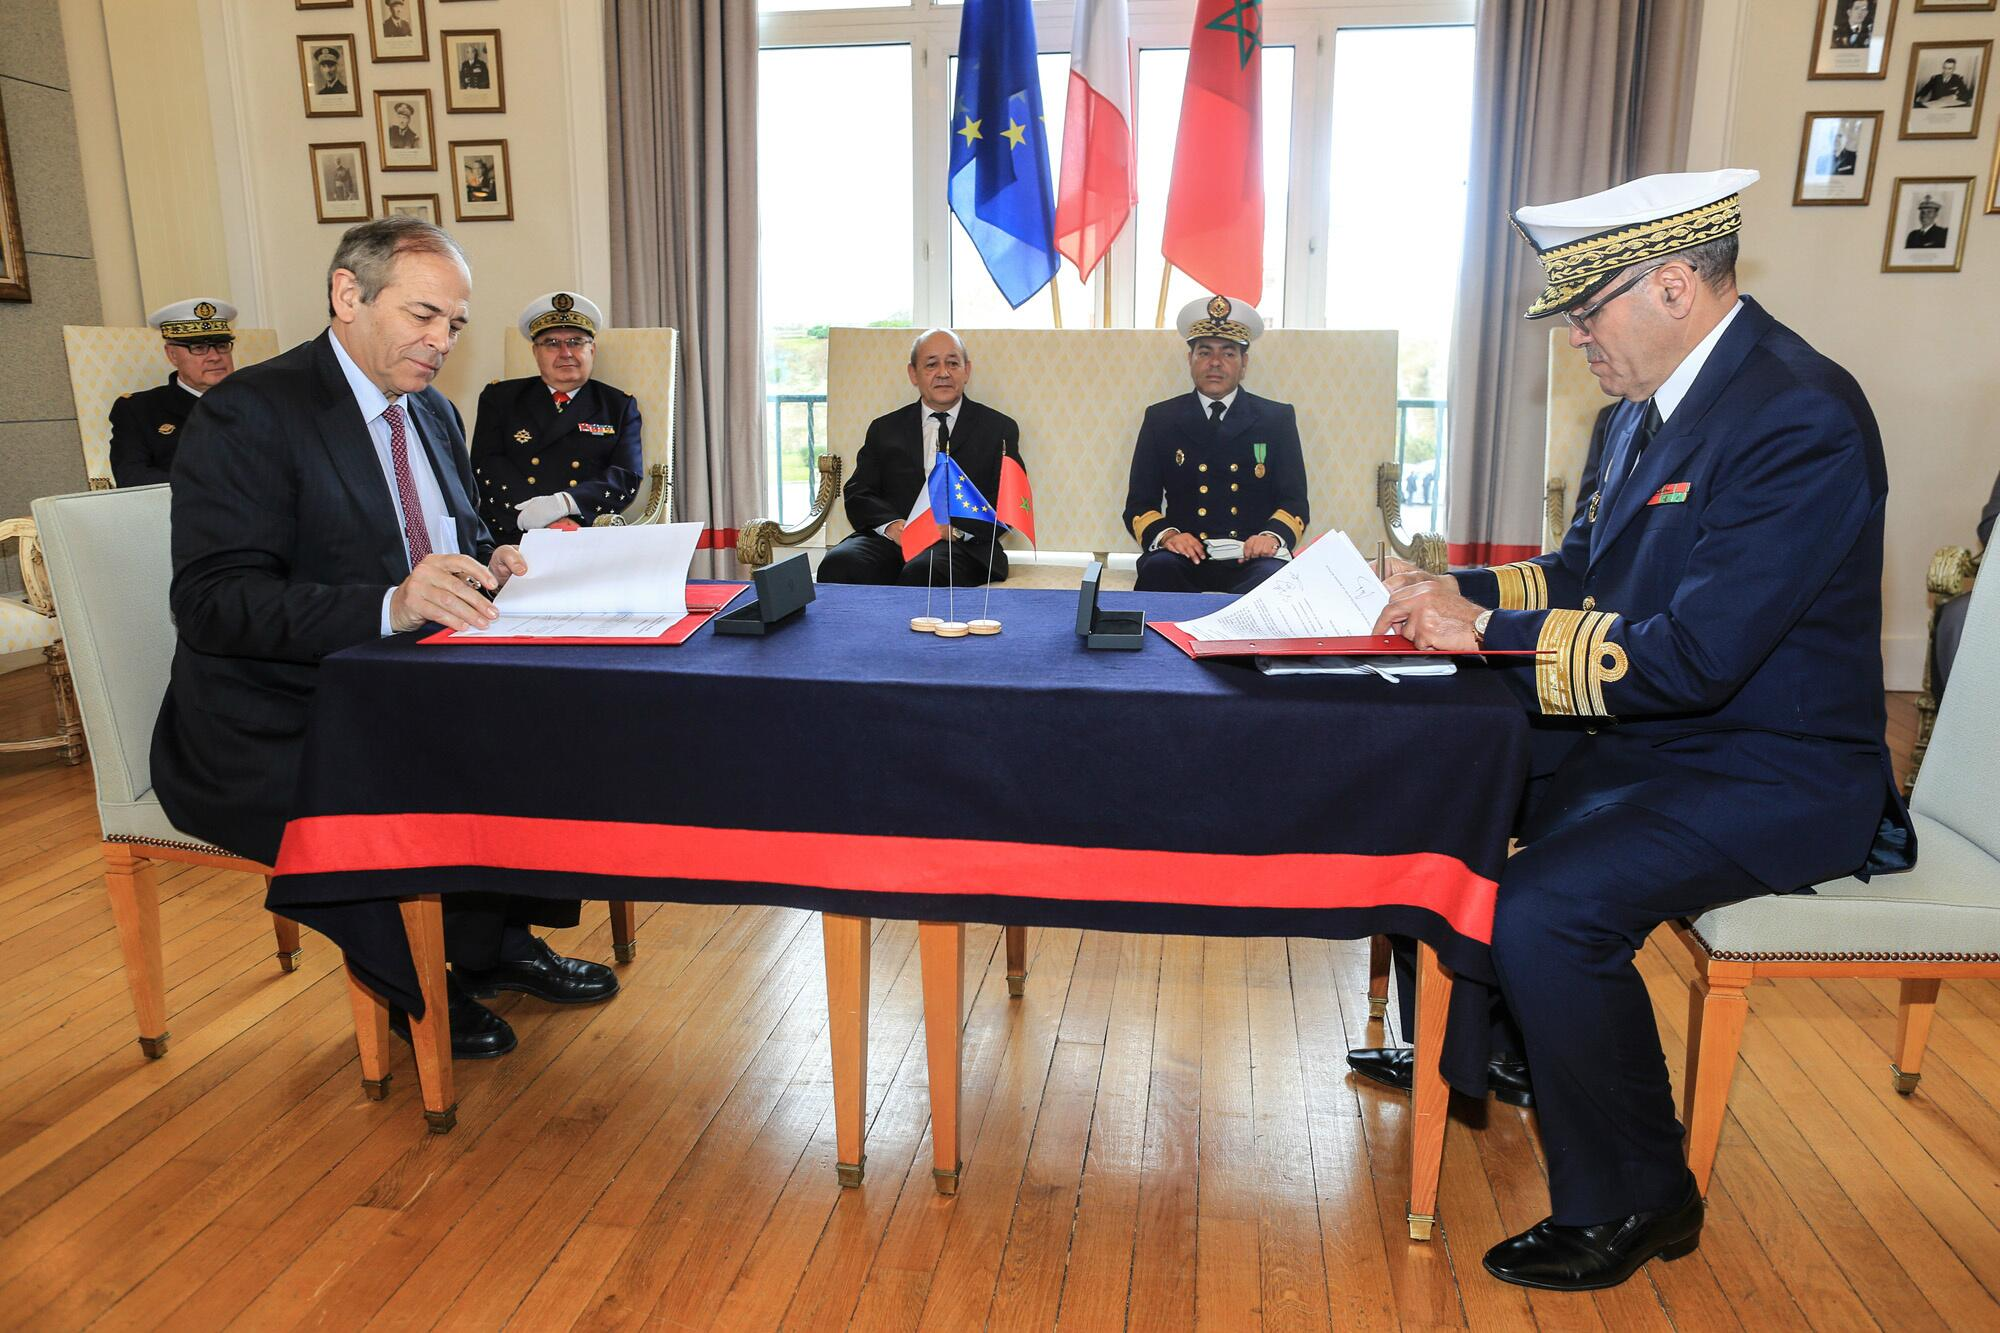 Royal Moroccan Navy FREMM Frigate / FREMM Marocaine - Mohammed VI BfPNhJTCMAEhH8B